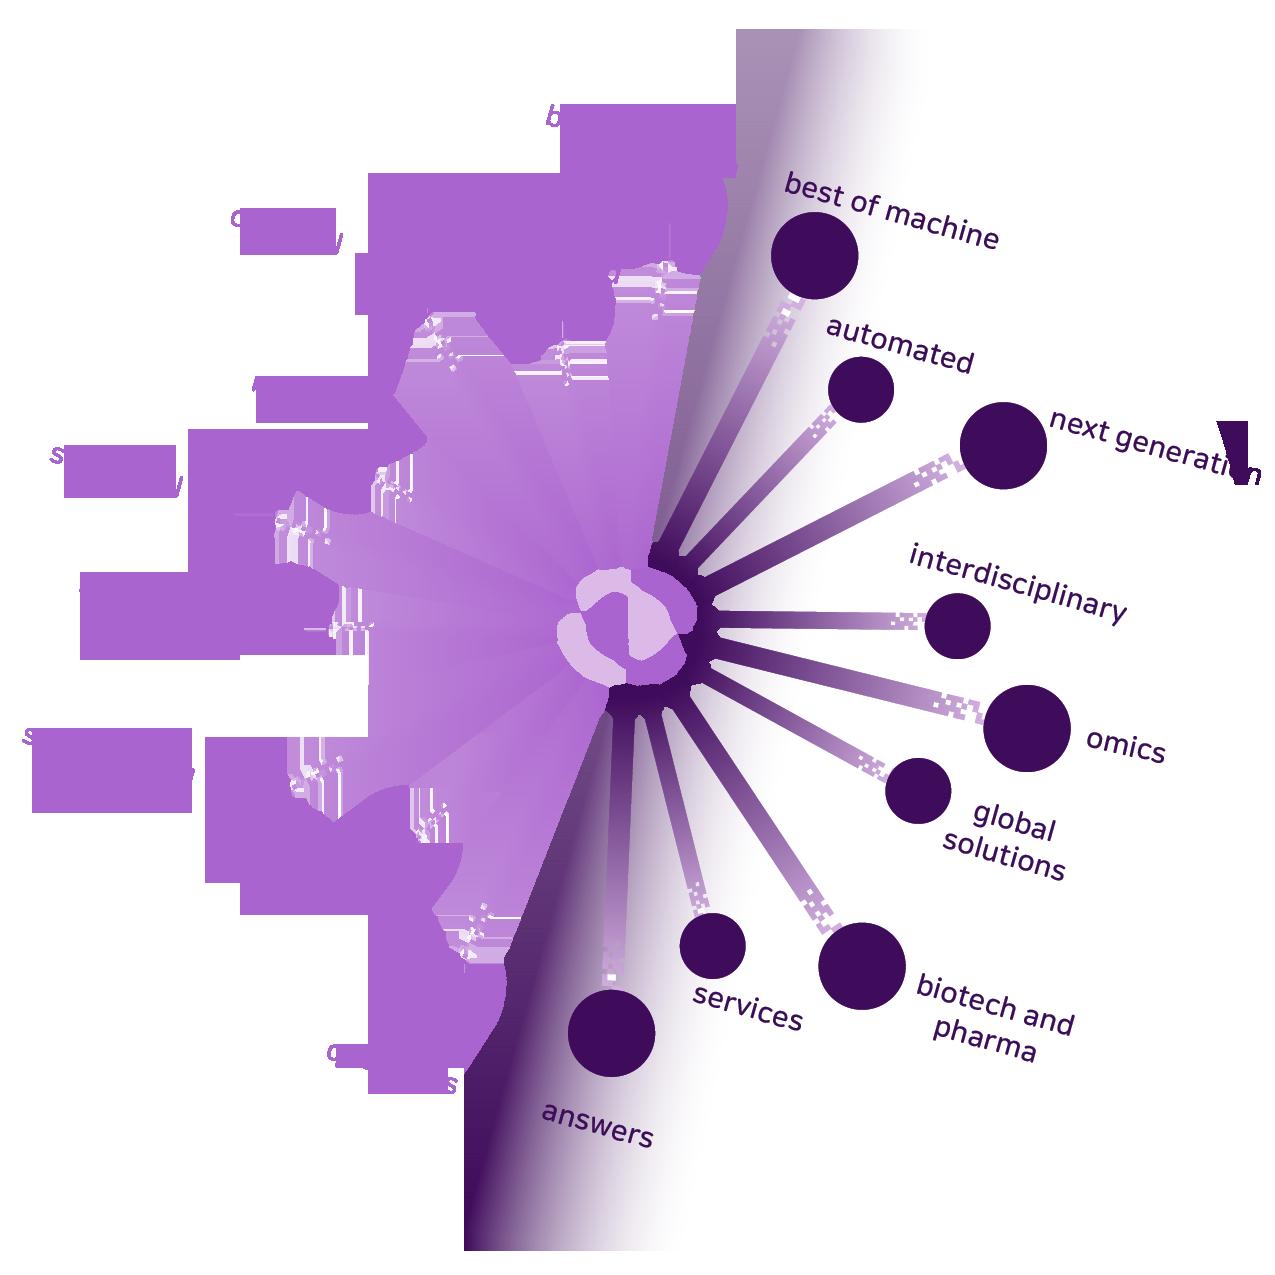 interdisciplinary services